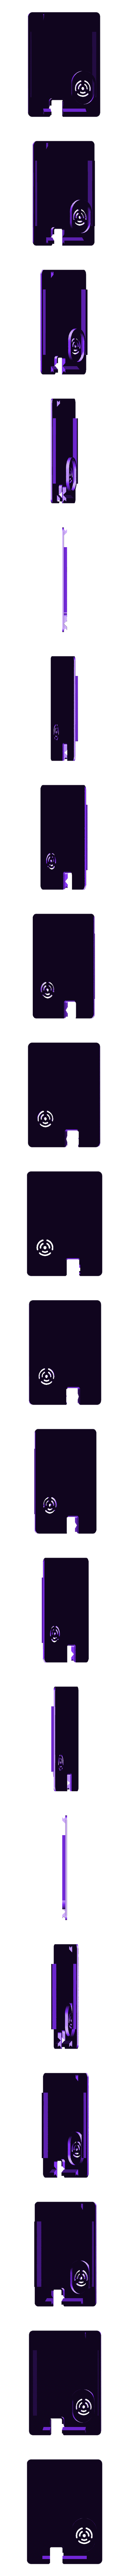 pyp-back.stl Download free STL file PyPortal Case • Object to 3D print, Adafruit